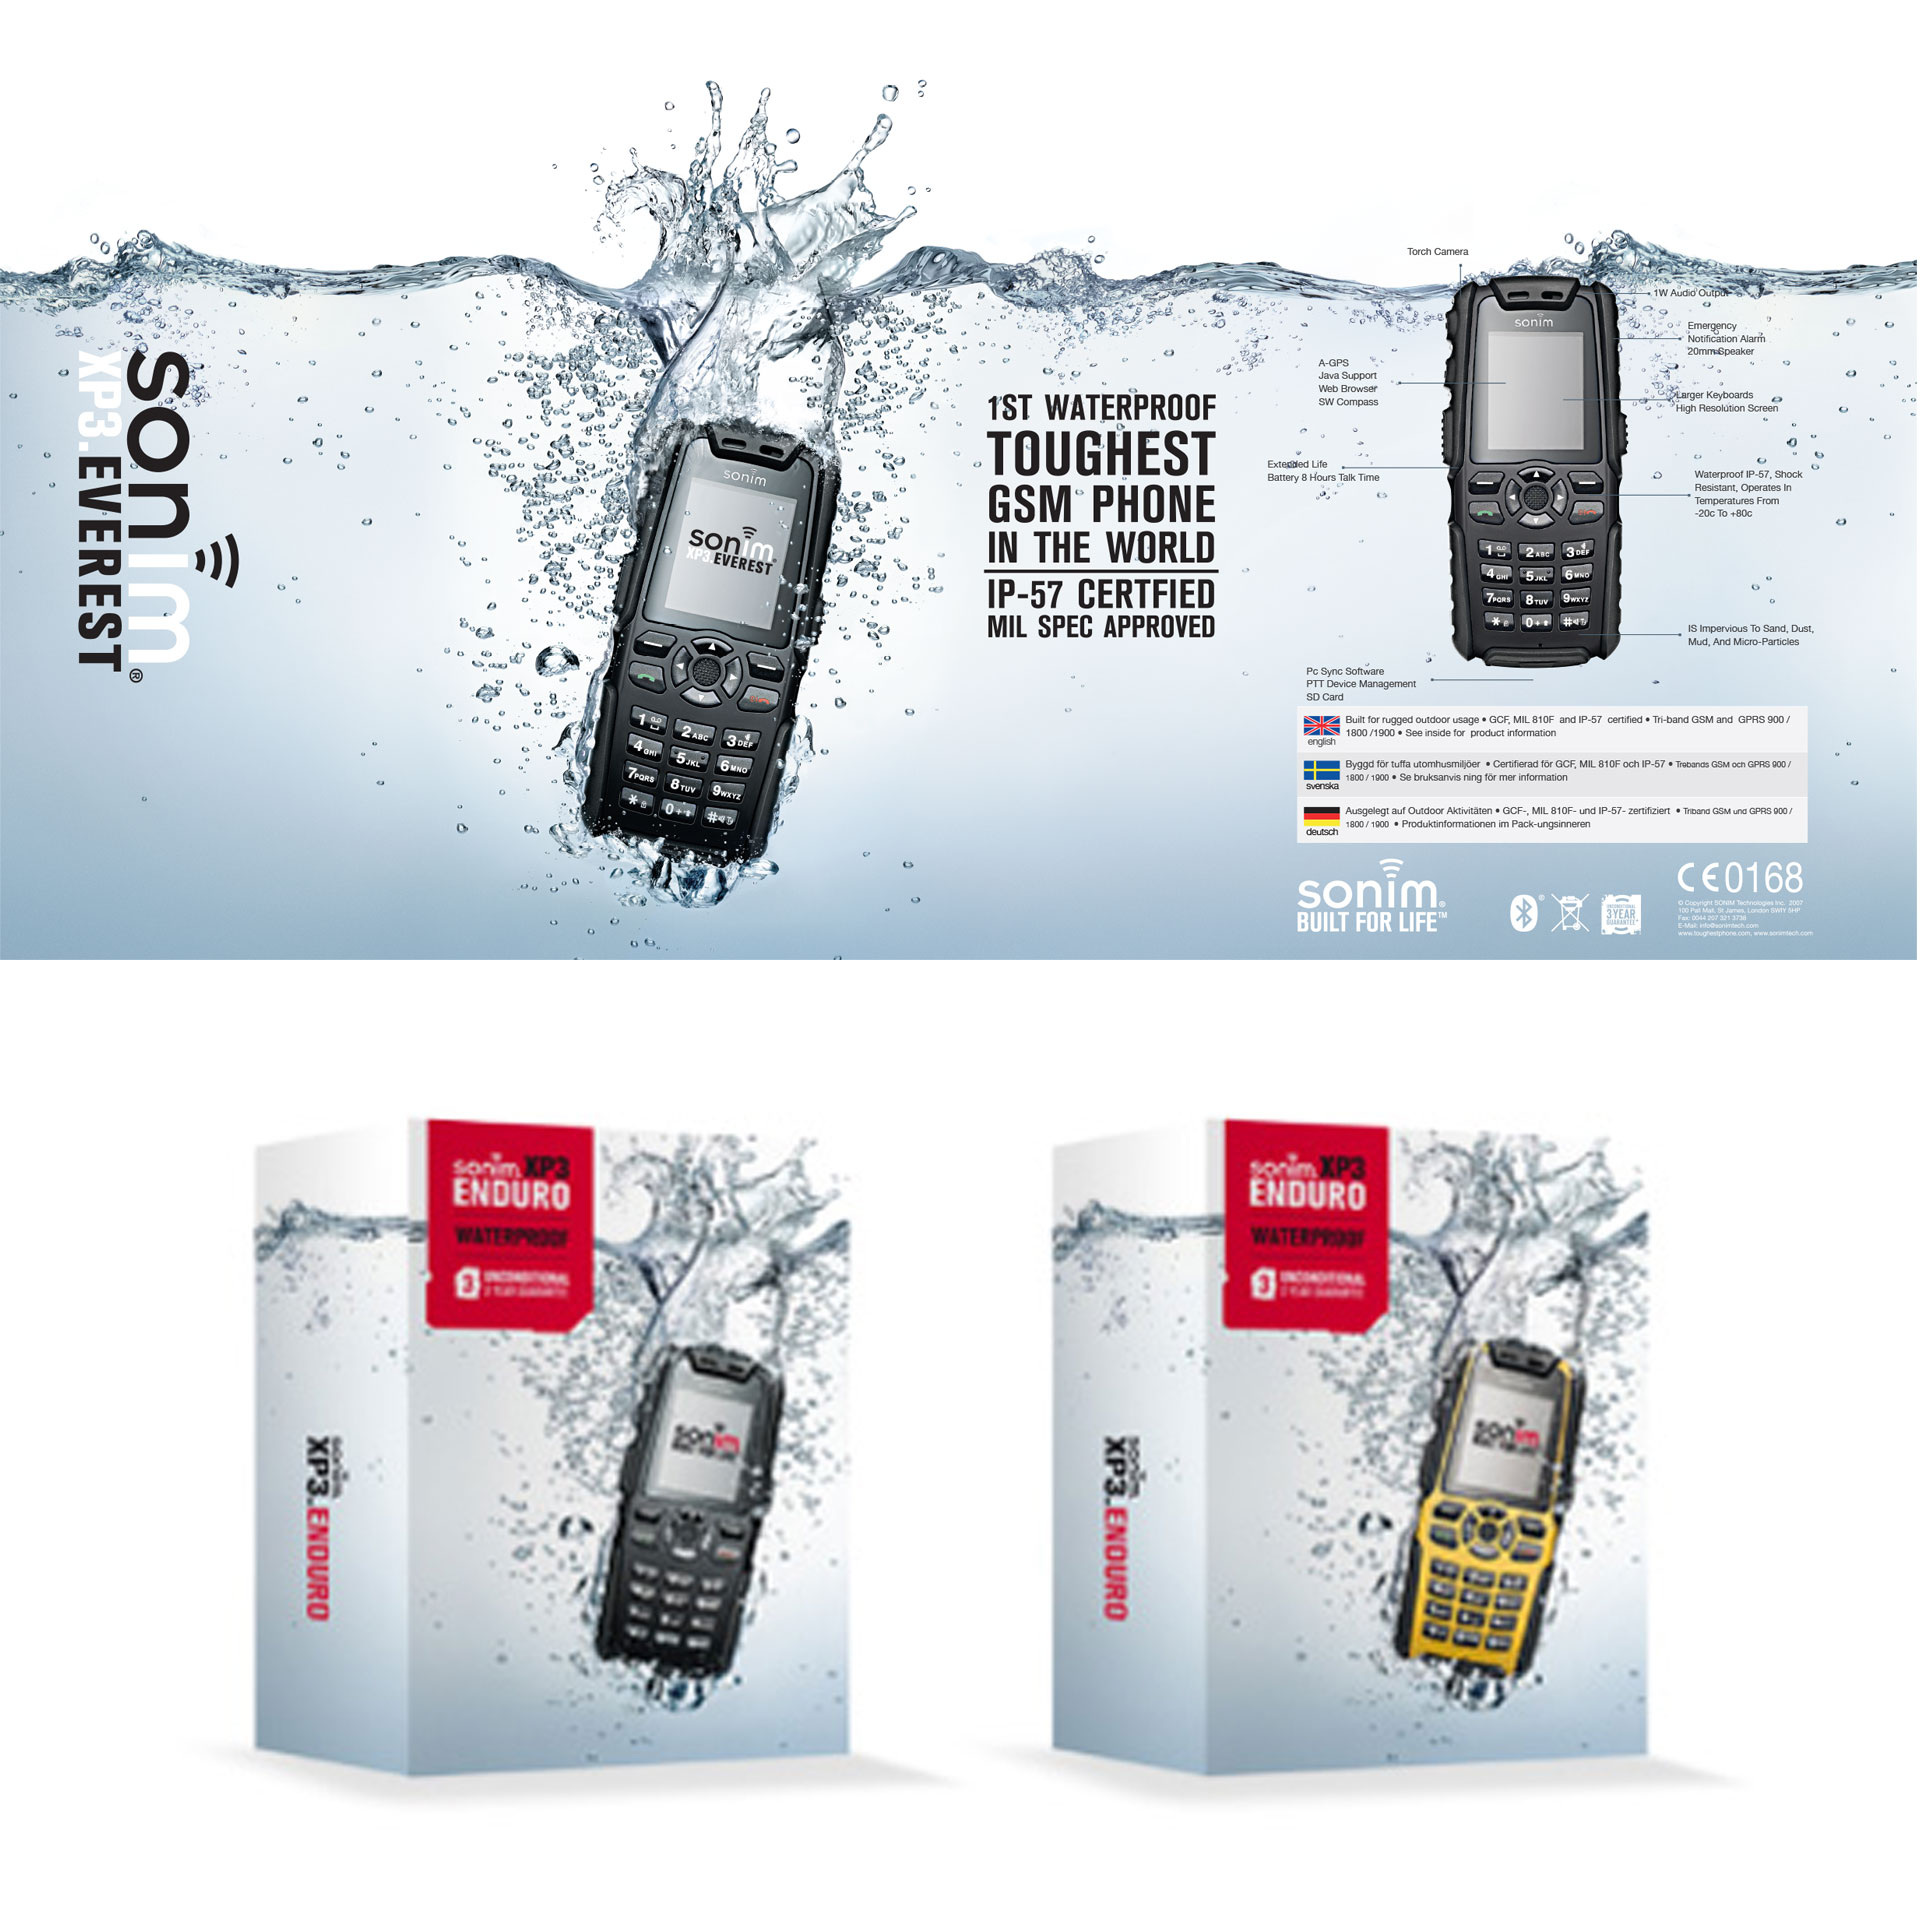 Sonim_Package-Design_עיצוב-אריזות